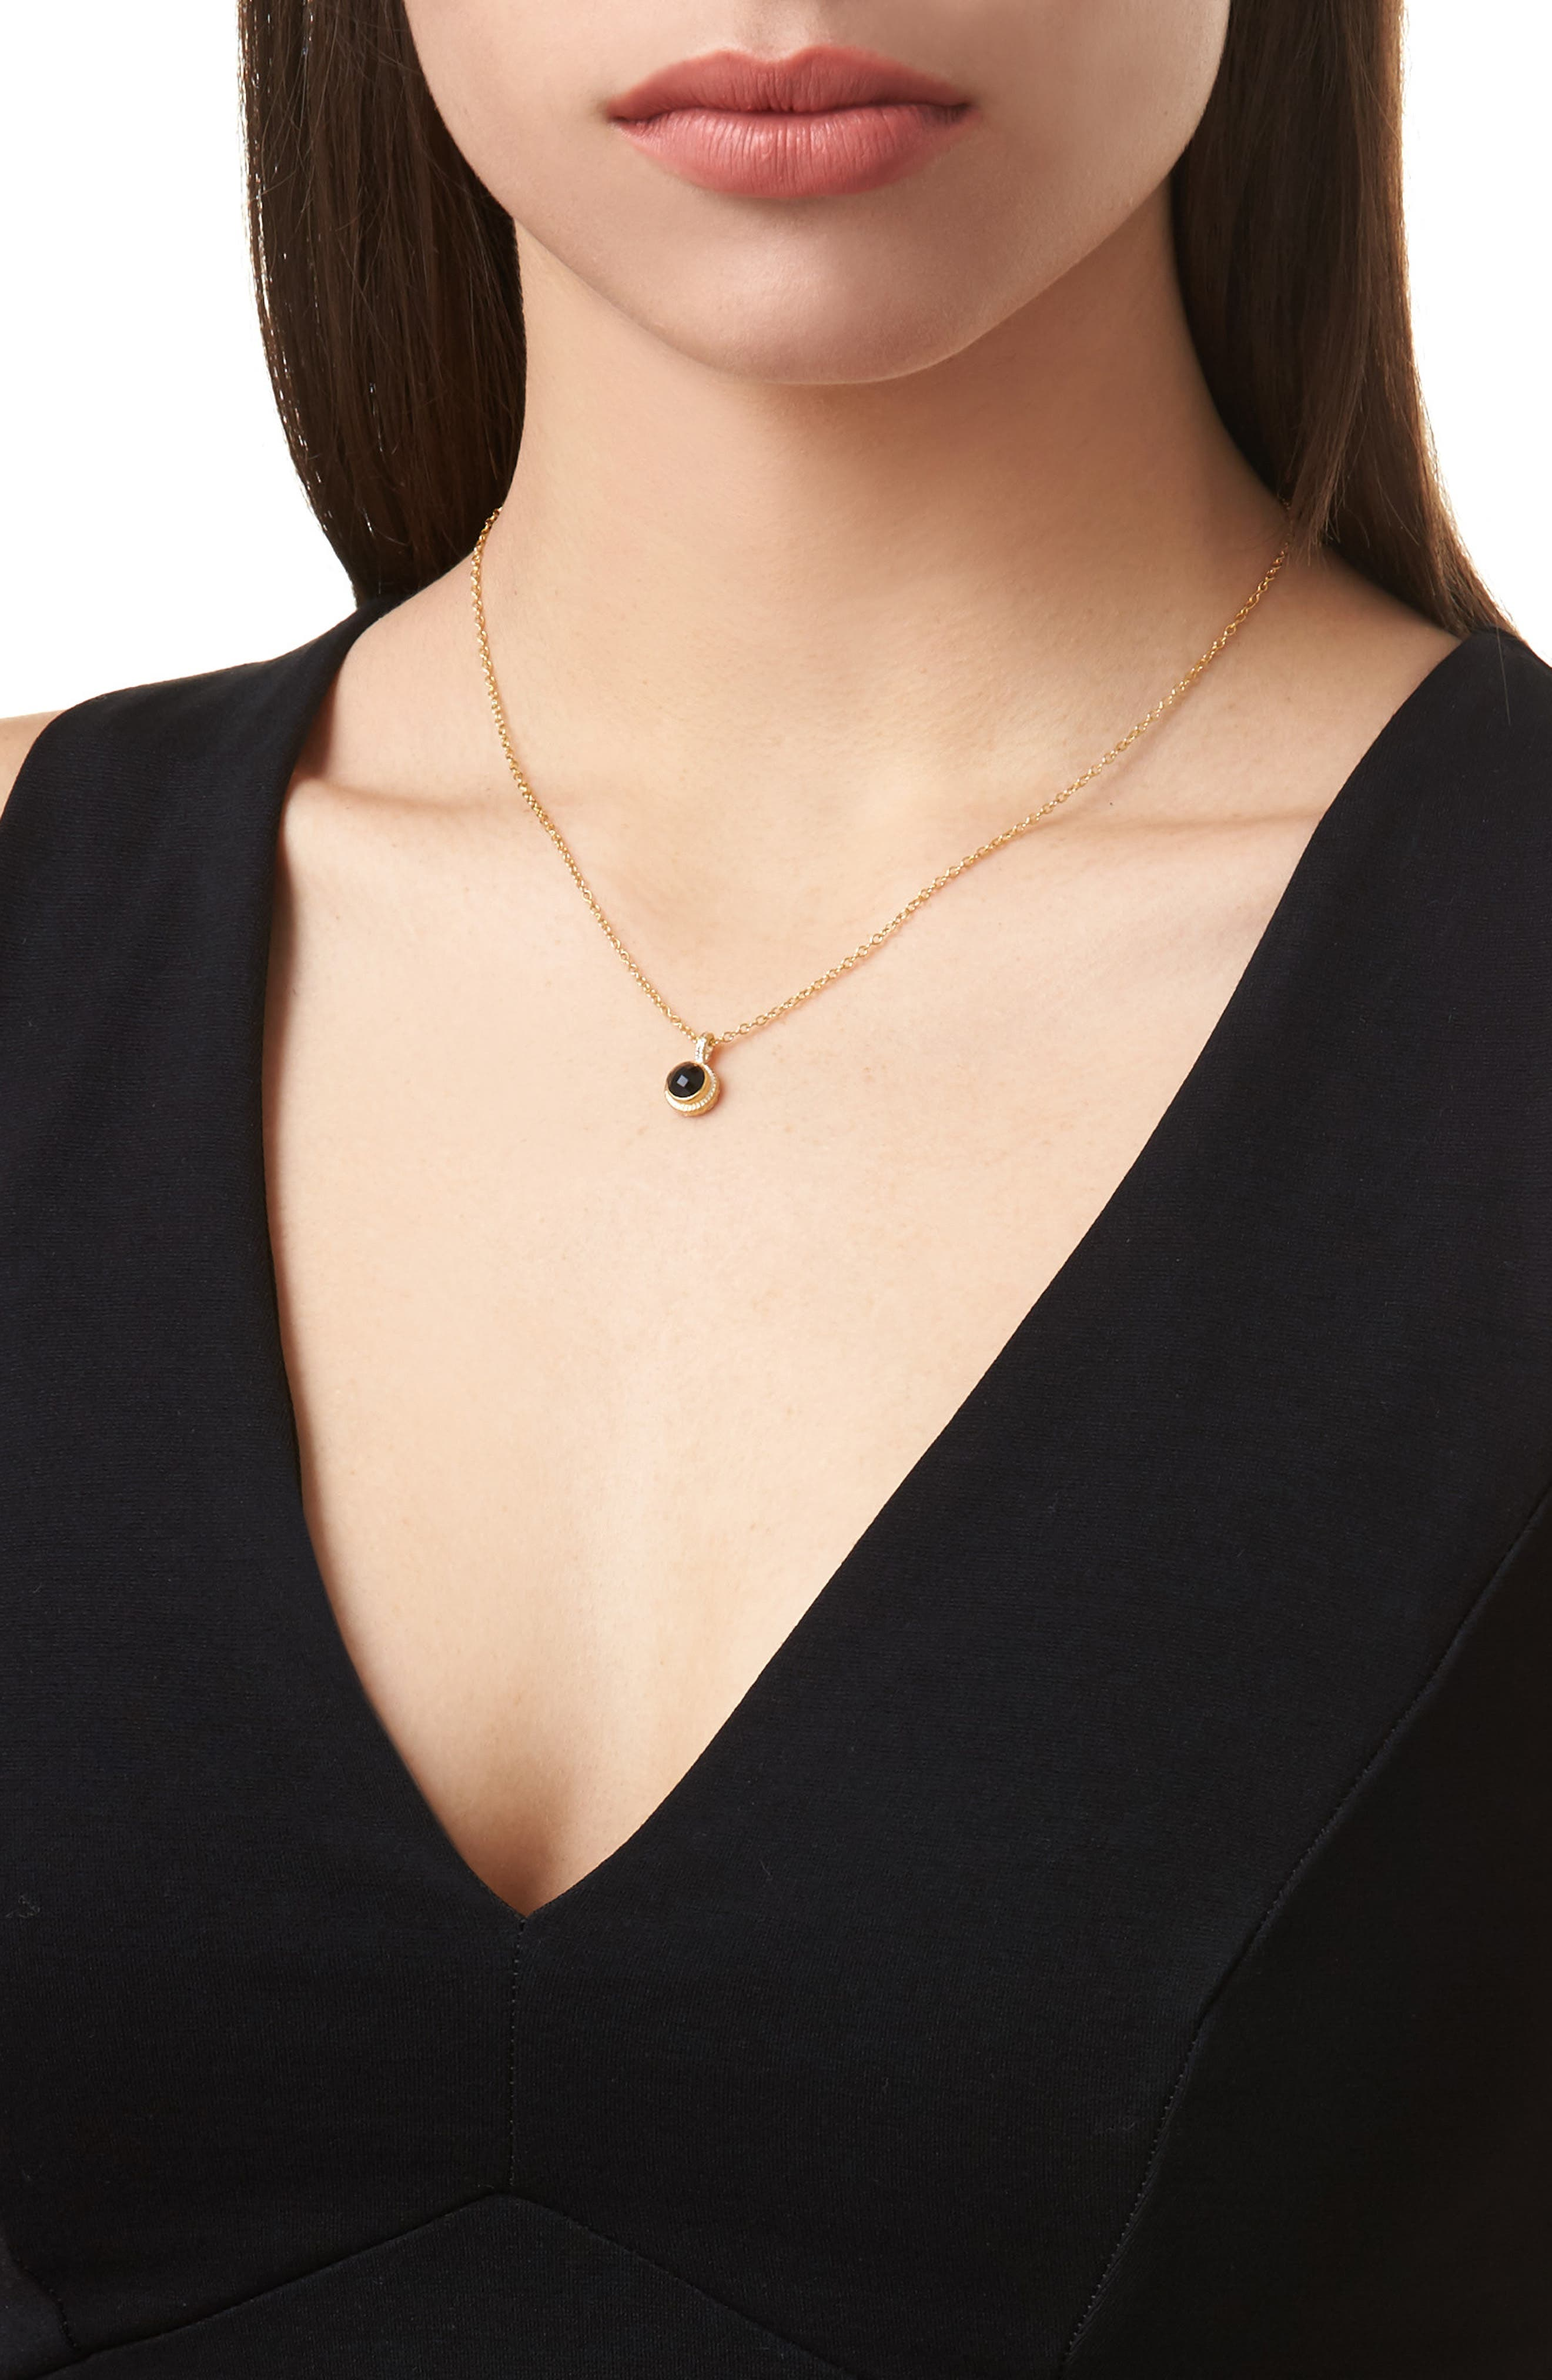 Semiprecious Stone Round Drop Pendant Necklace,                             Alternate thumbnail 2, color,                             Gold/ Black Onyx